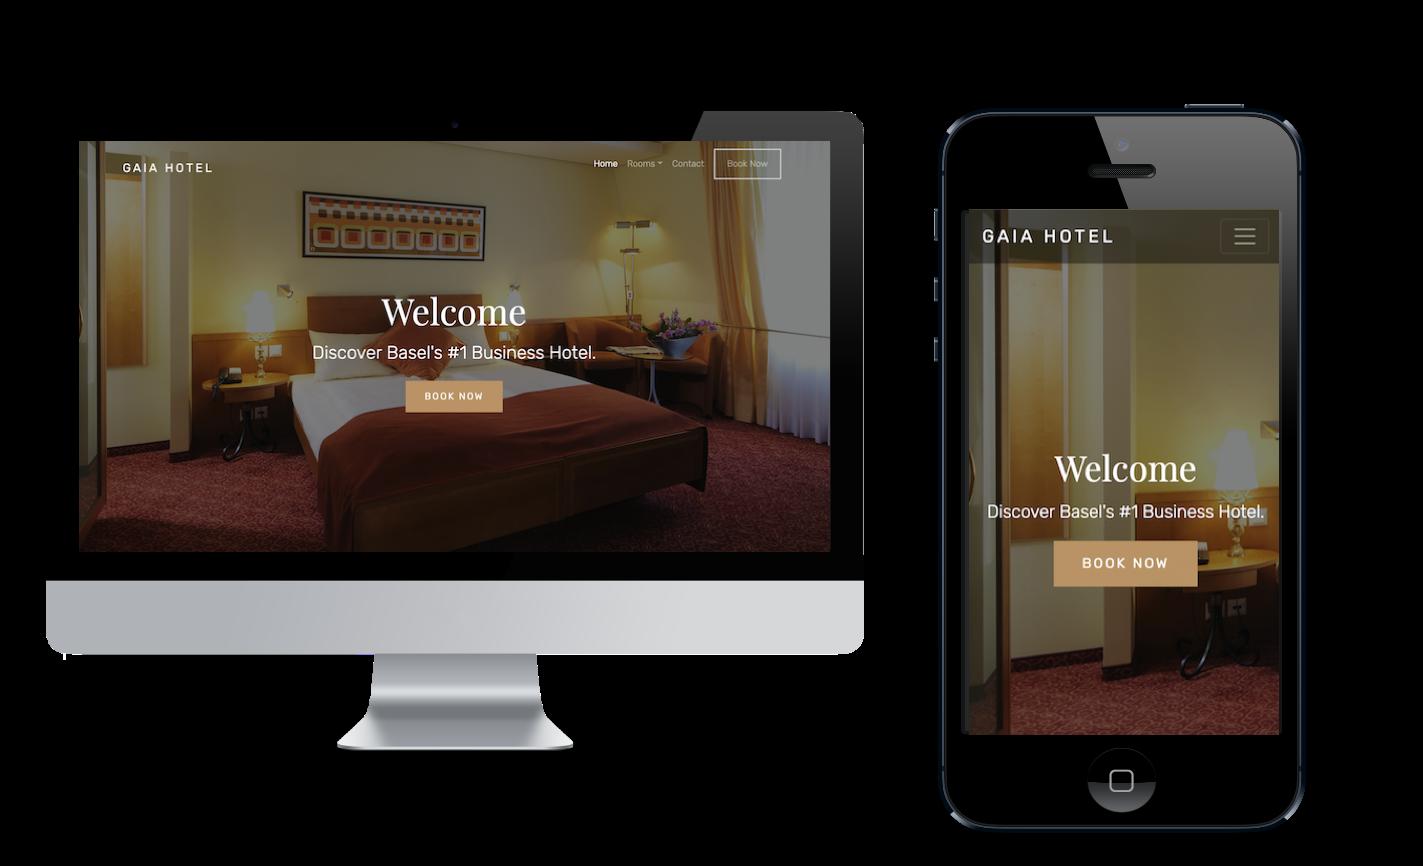 Gaia Hotel Webseite